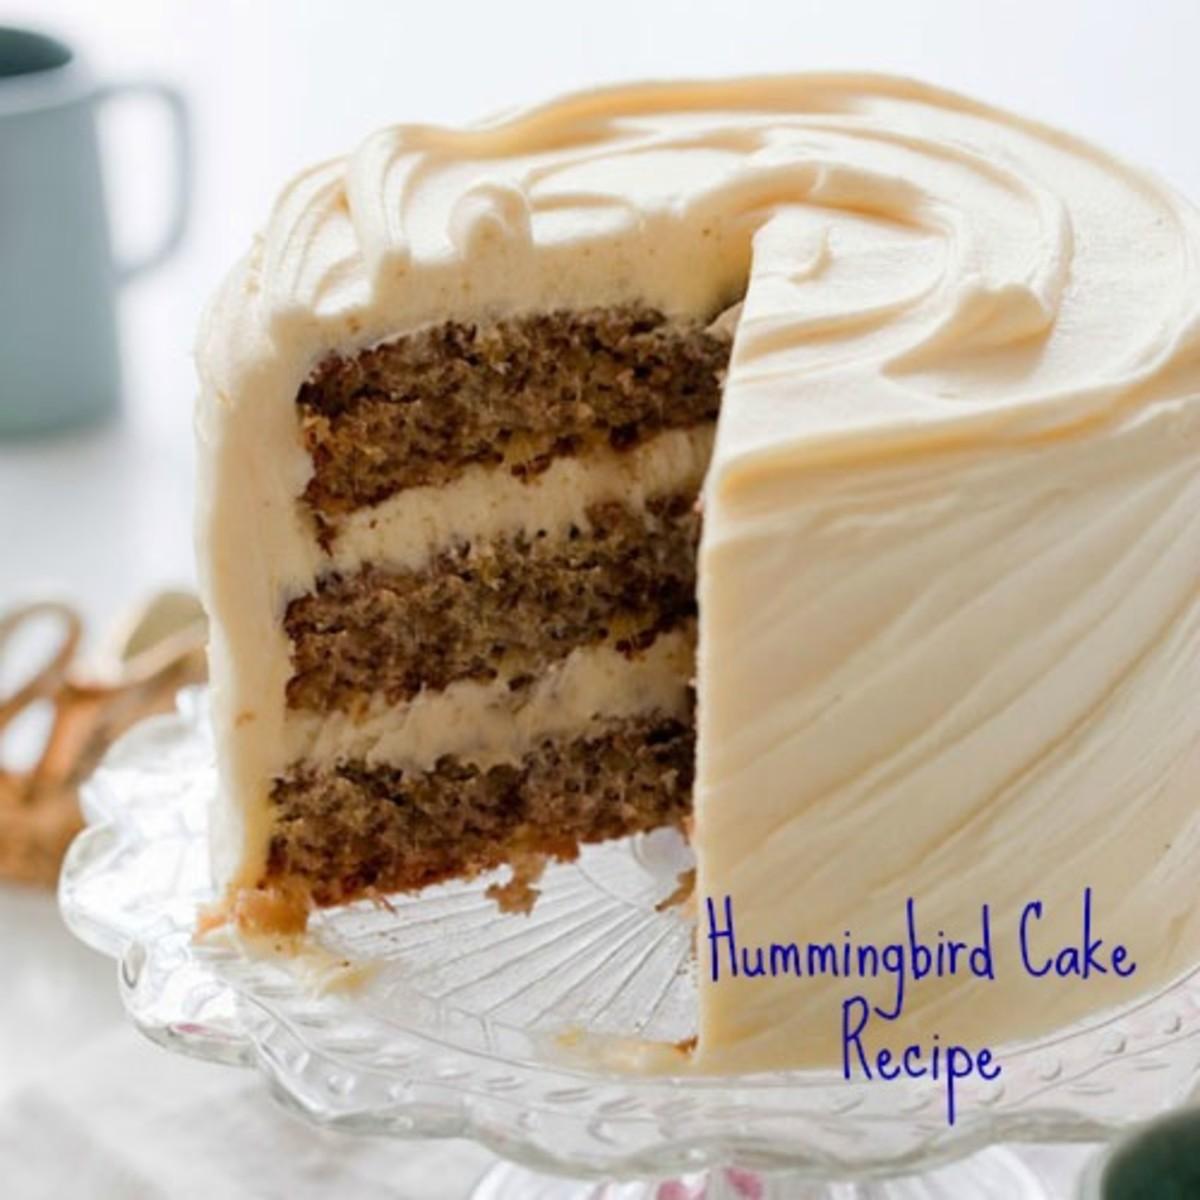 Hummingbird Cake Recipe: A Favorite Southern Dessert